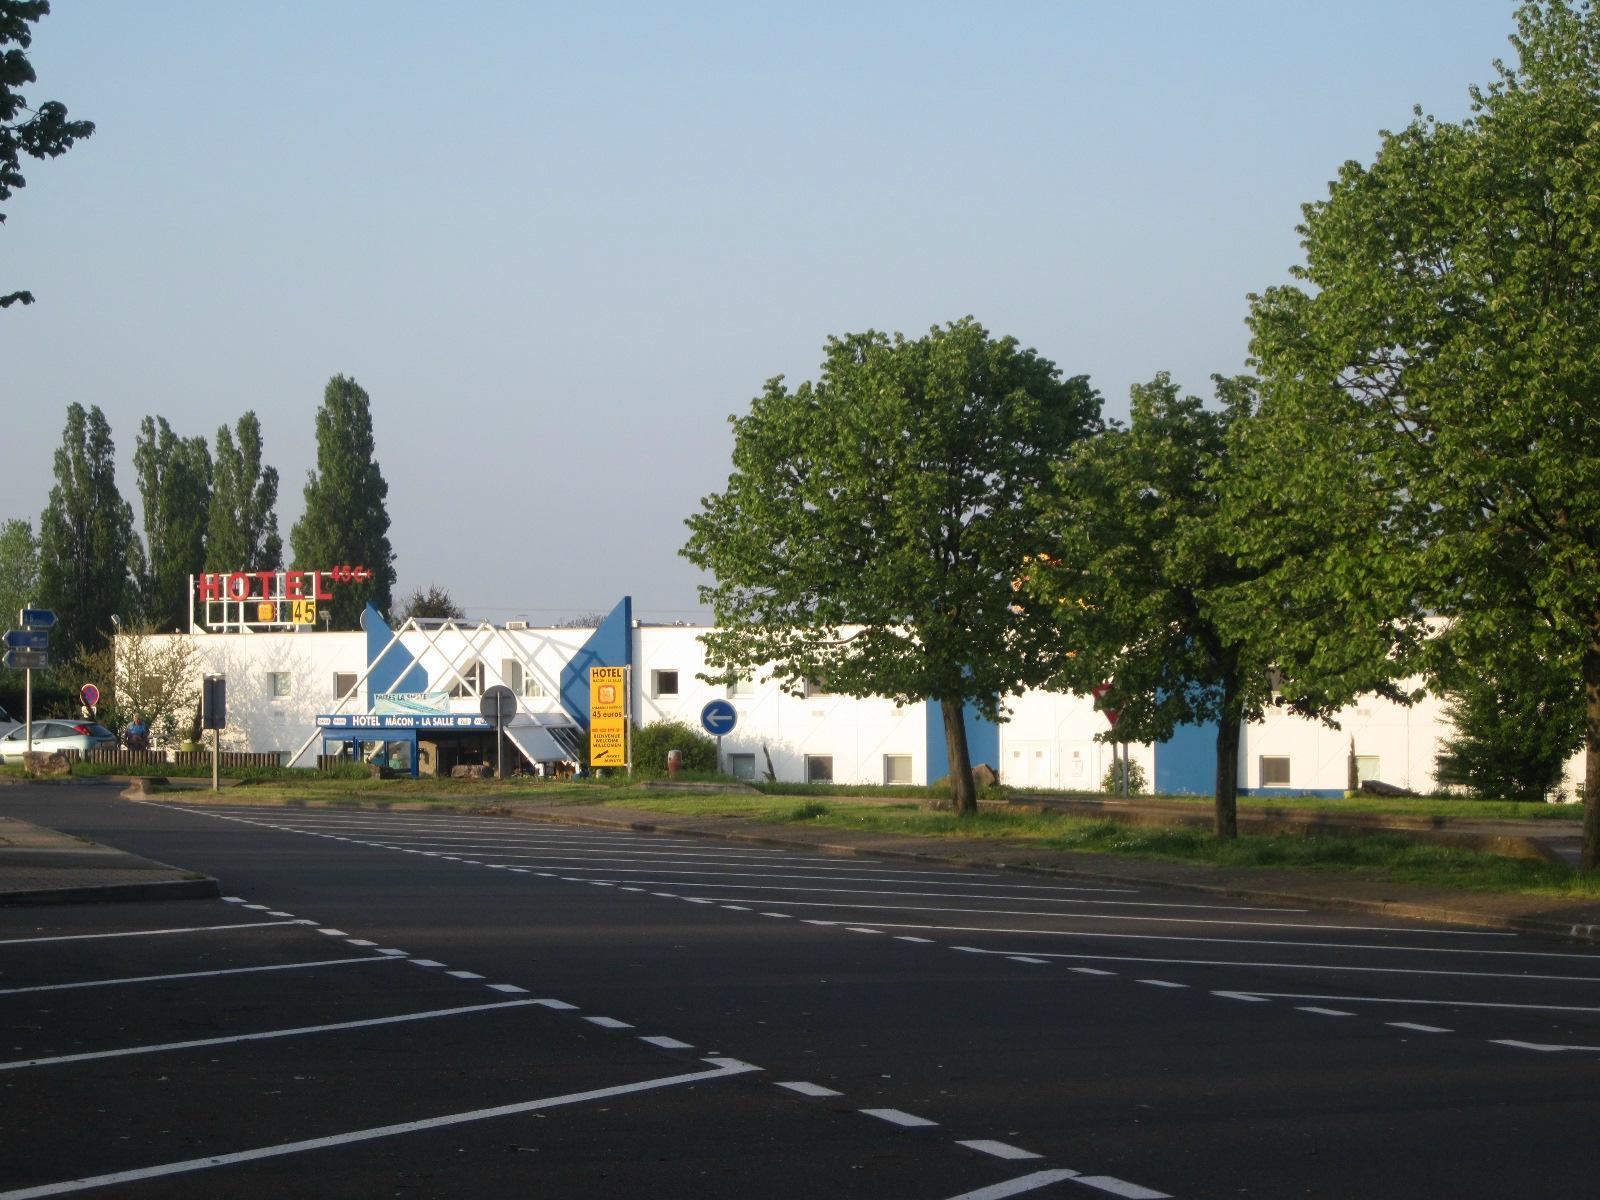 P'tit Dej-HOTEL Macon-La Salle-A6